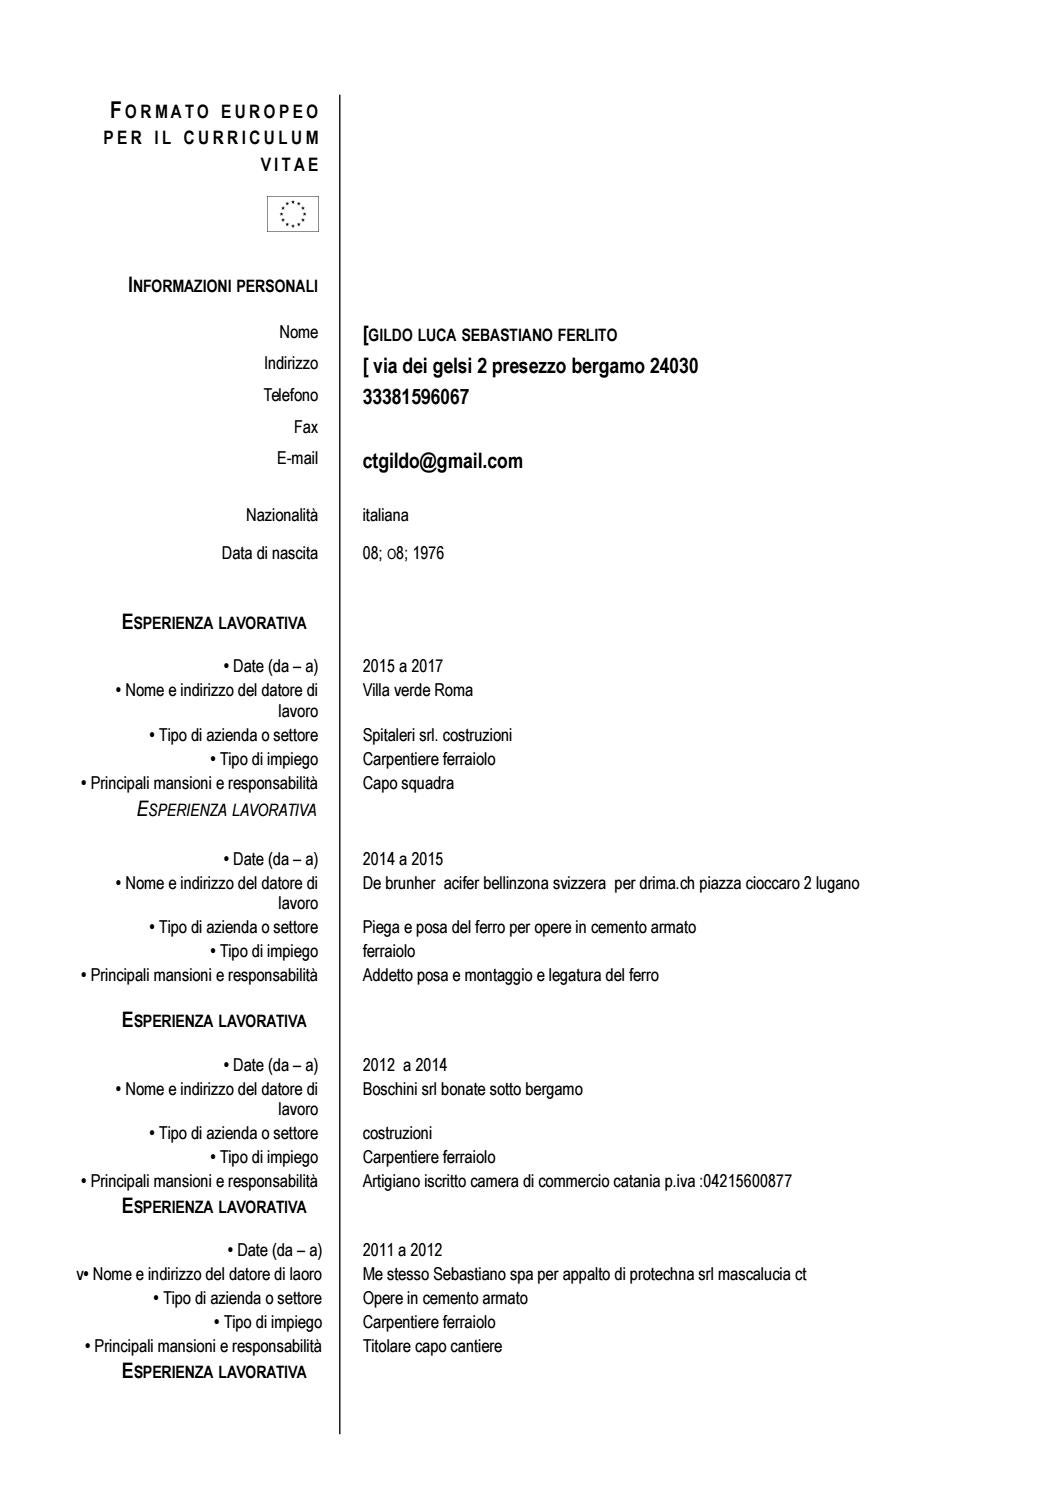 Carpentieri Edili In Svizzera modelo di curriculum vitae europeo (1) by ferlito gildo - issuu